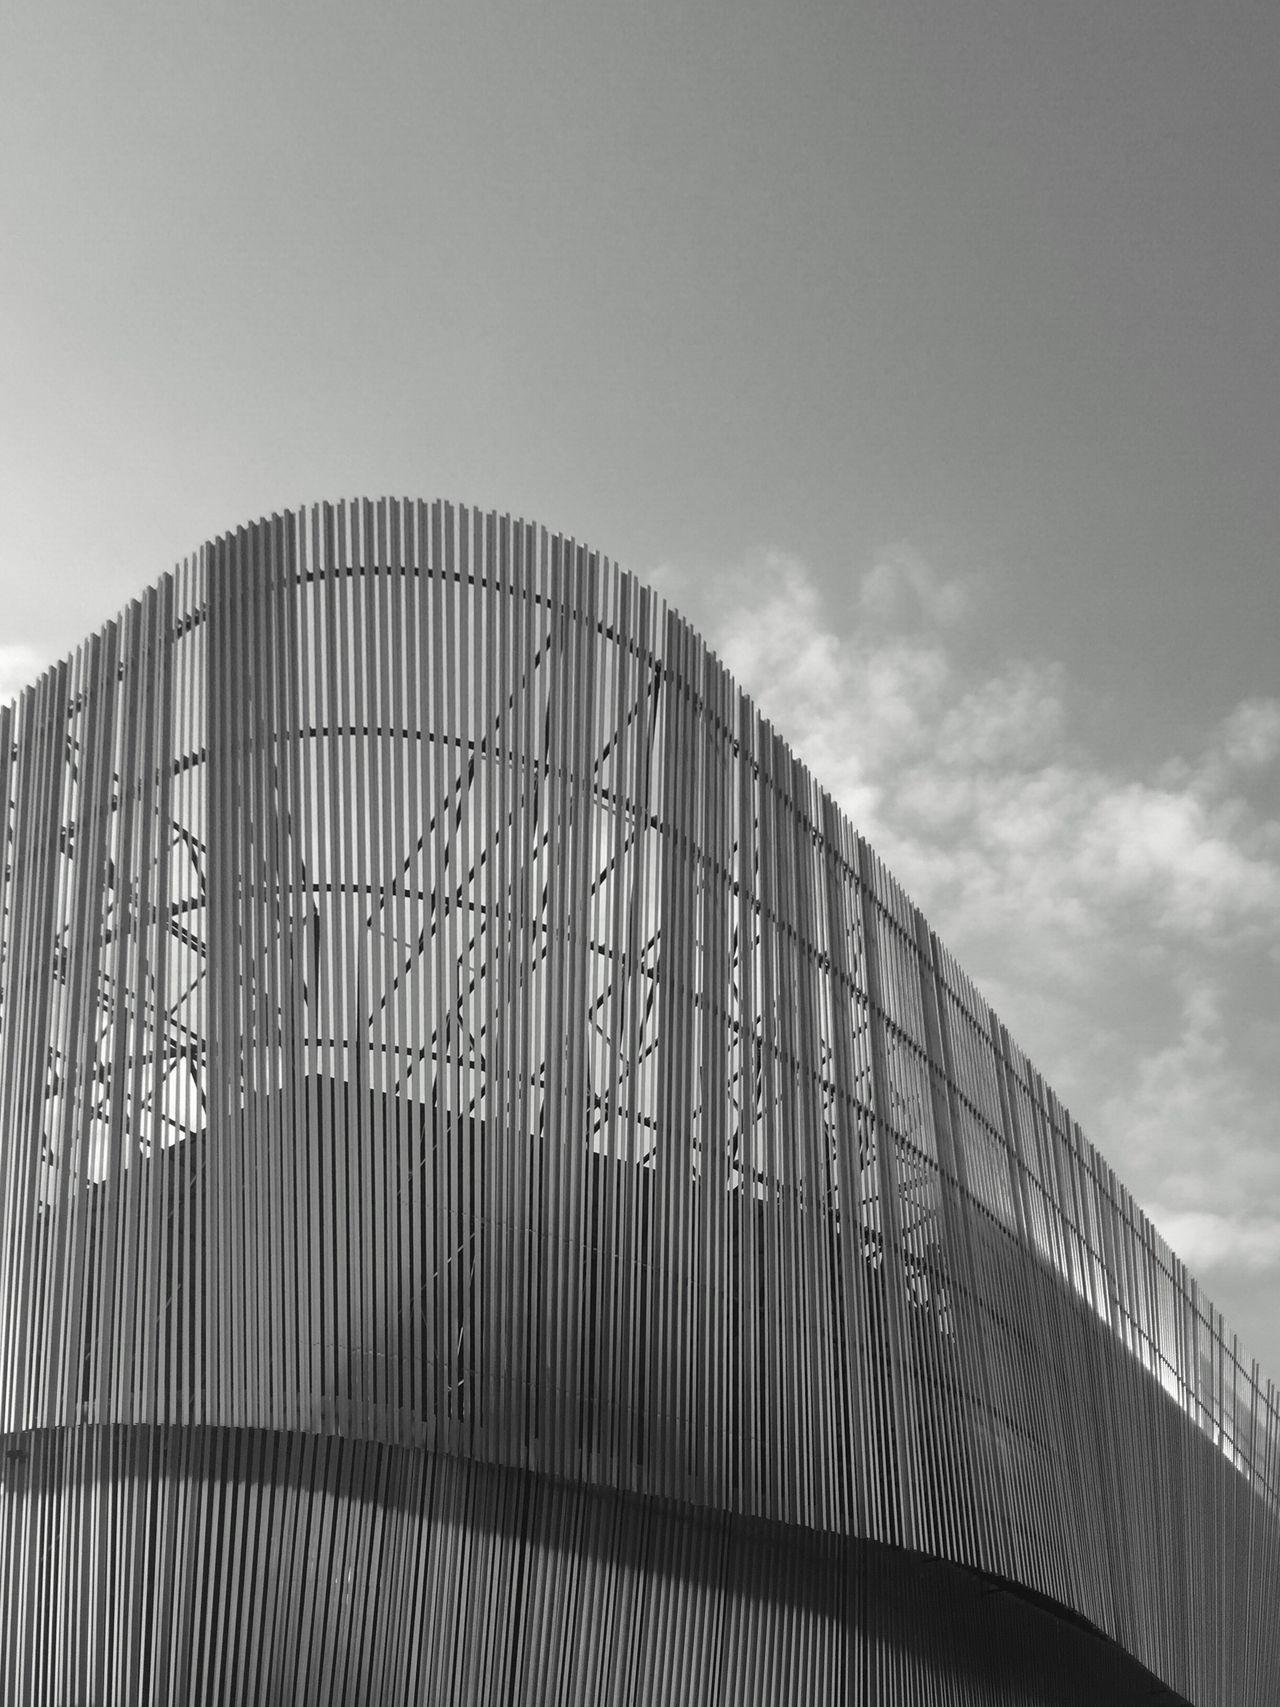 Architecture Built Structure Day Architectural Feature EyeEm Black&white! Shadows EyeEm EyeEm Best Shots Minimalism Minimalist Bw_collection EyeEm Bnw Streetphoto_bw EyeEm Team Minimalism_bw Architecture Architectural Column Building Exterior Building Story